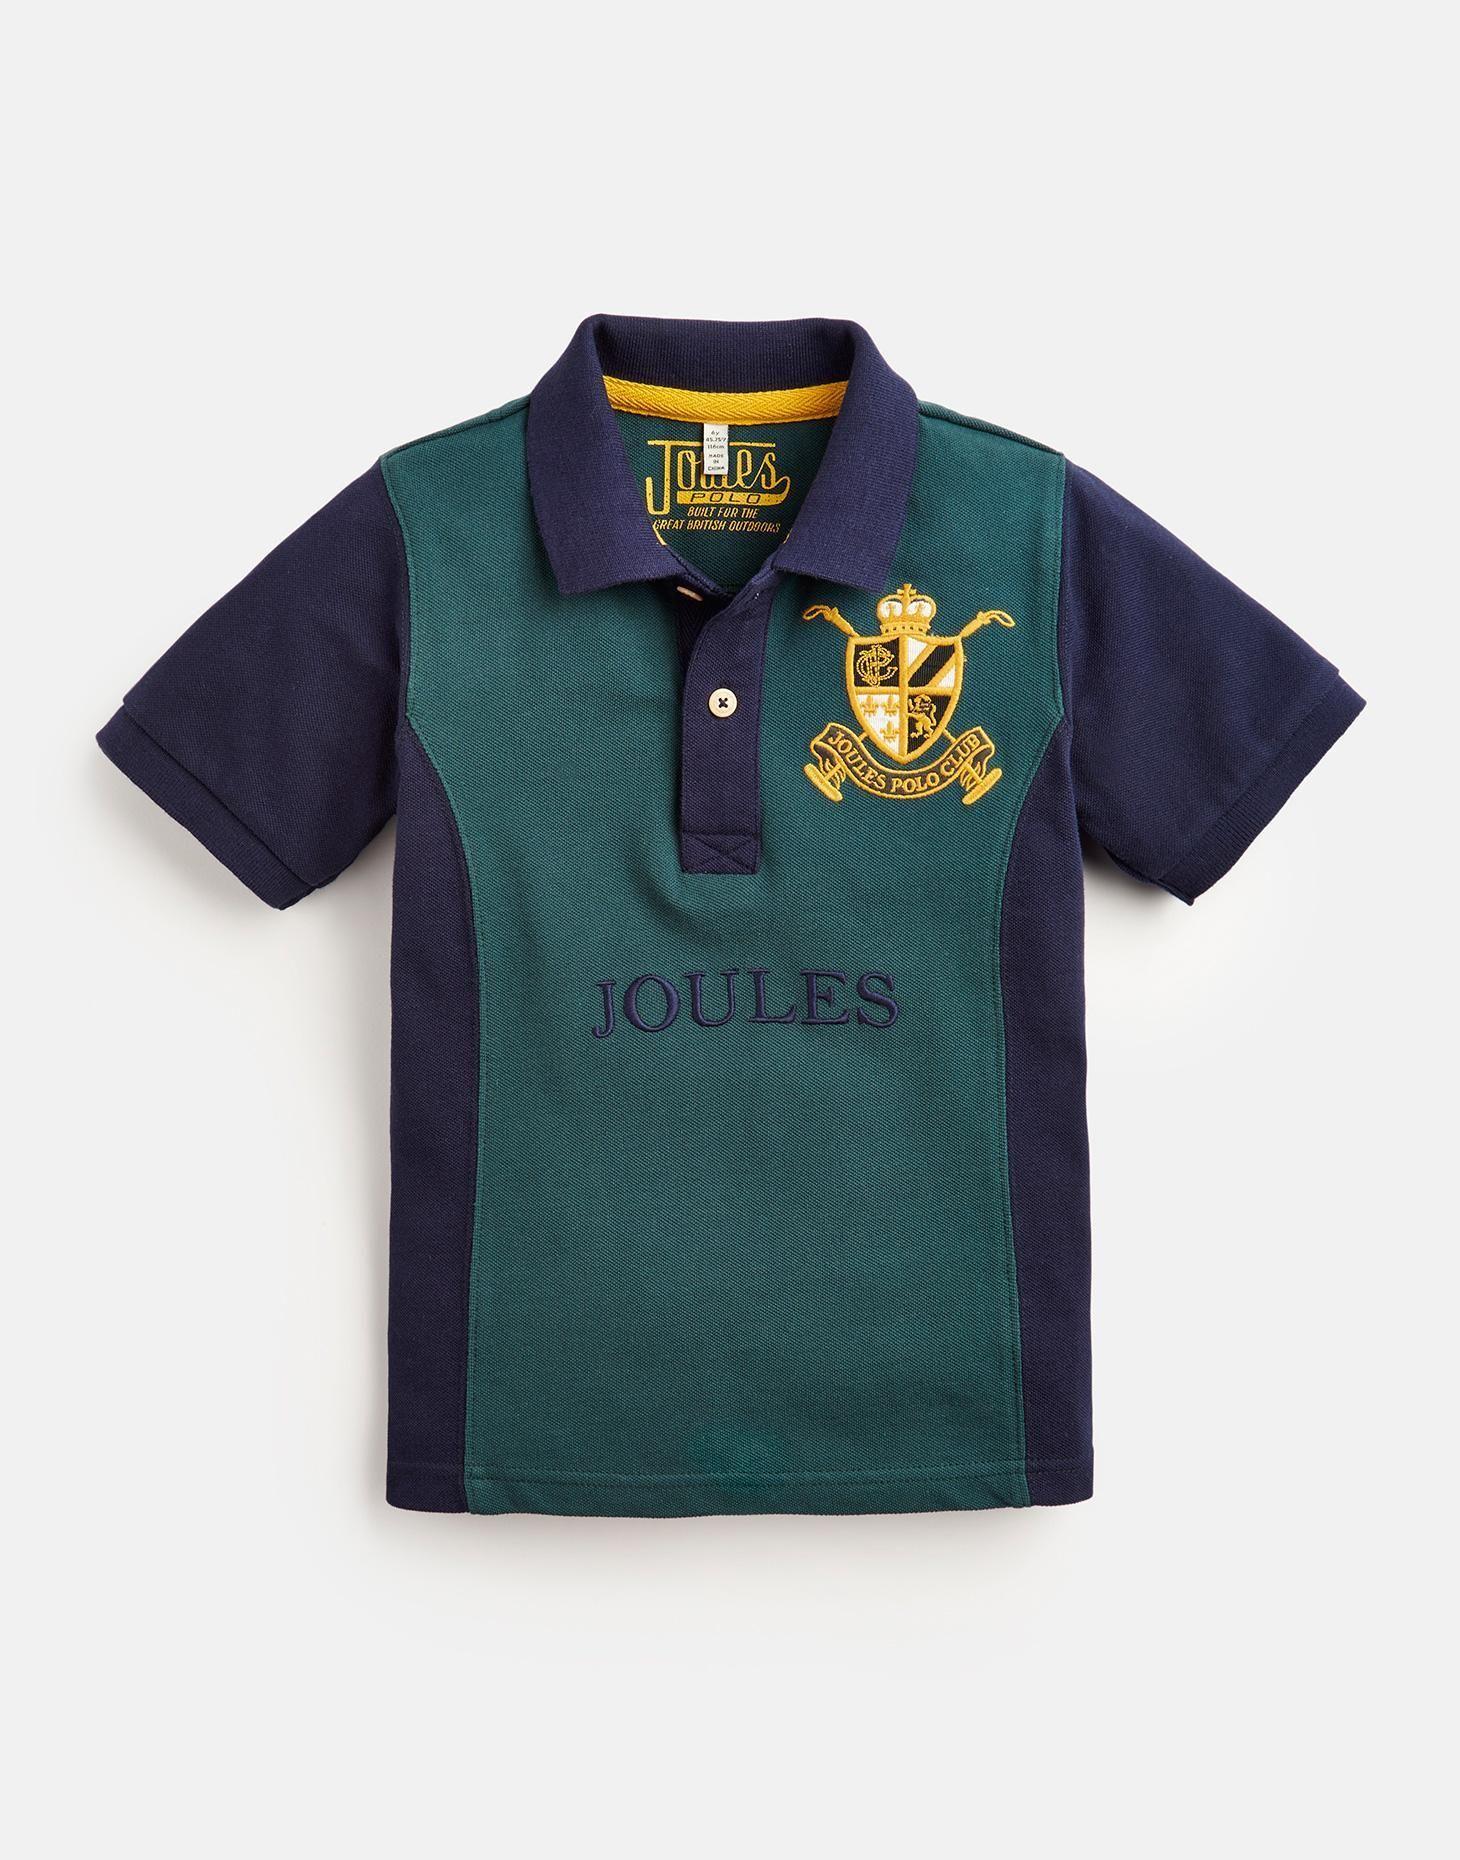 Boys Older Harry Dark Emerald Branded Polo Shirt Joules Uk The